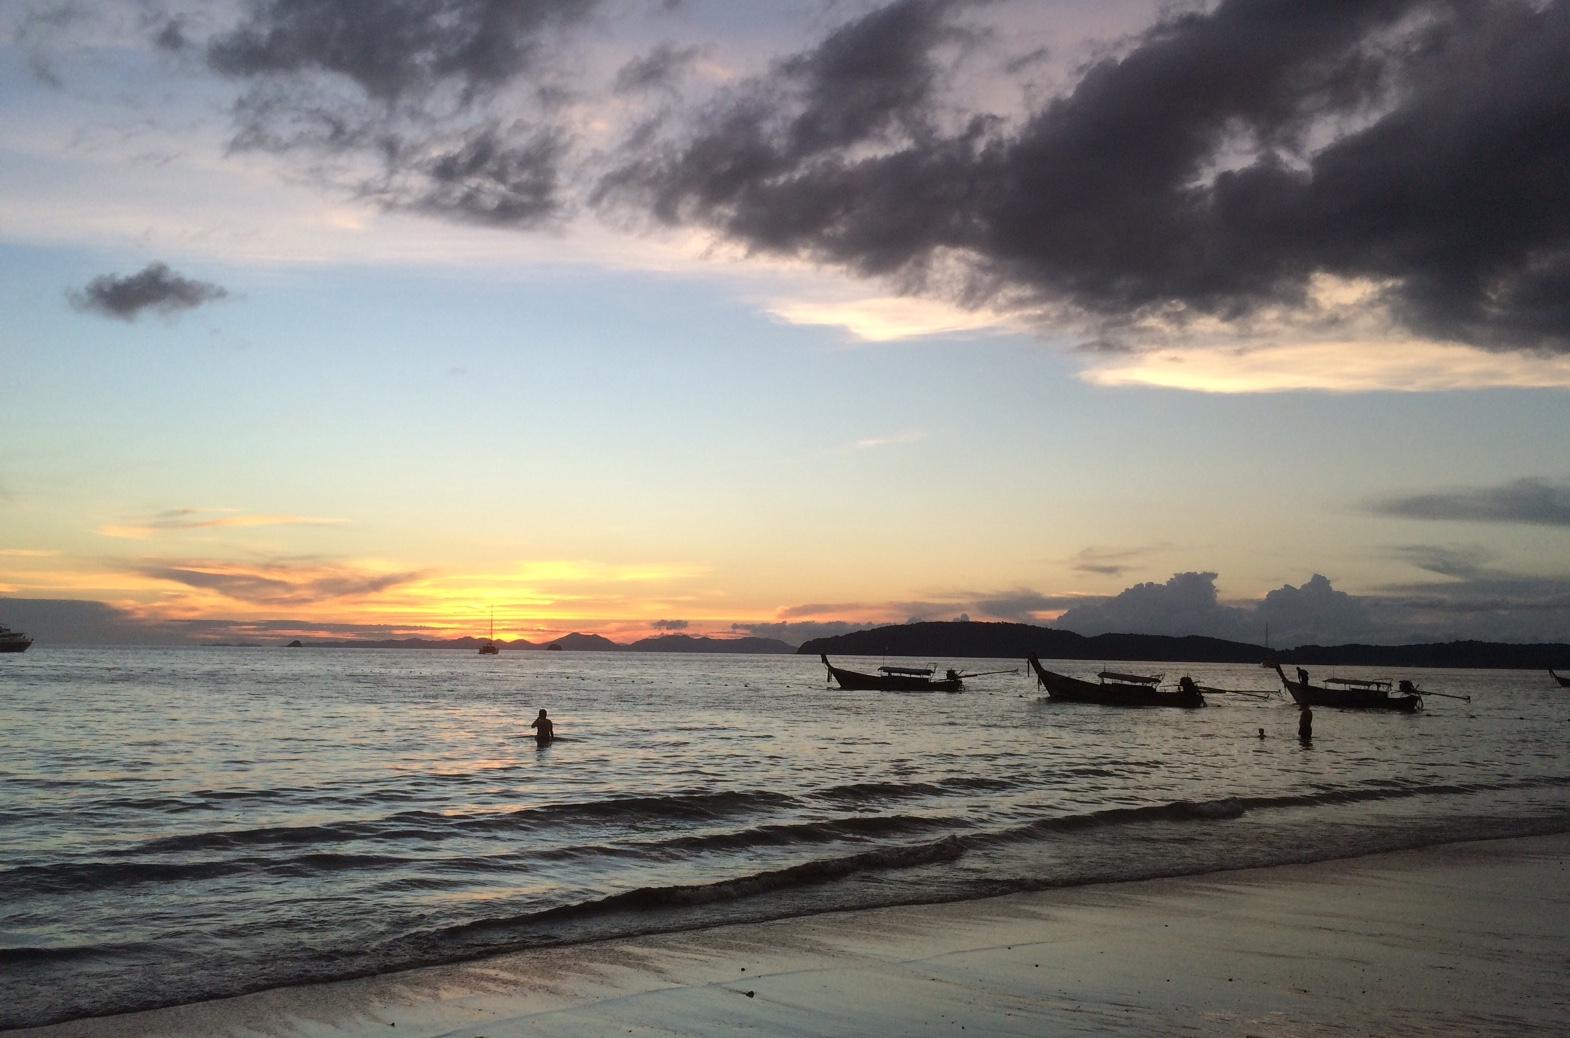 Sunset at Ao Nang beach, Krabi, Thailand!